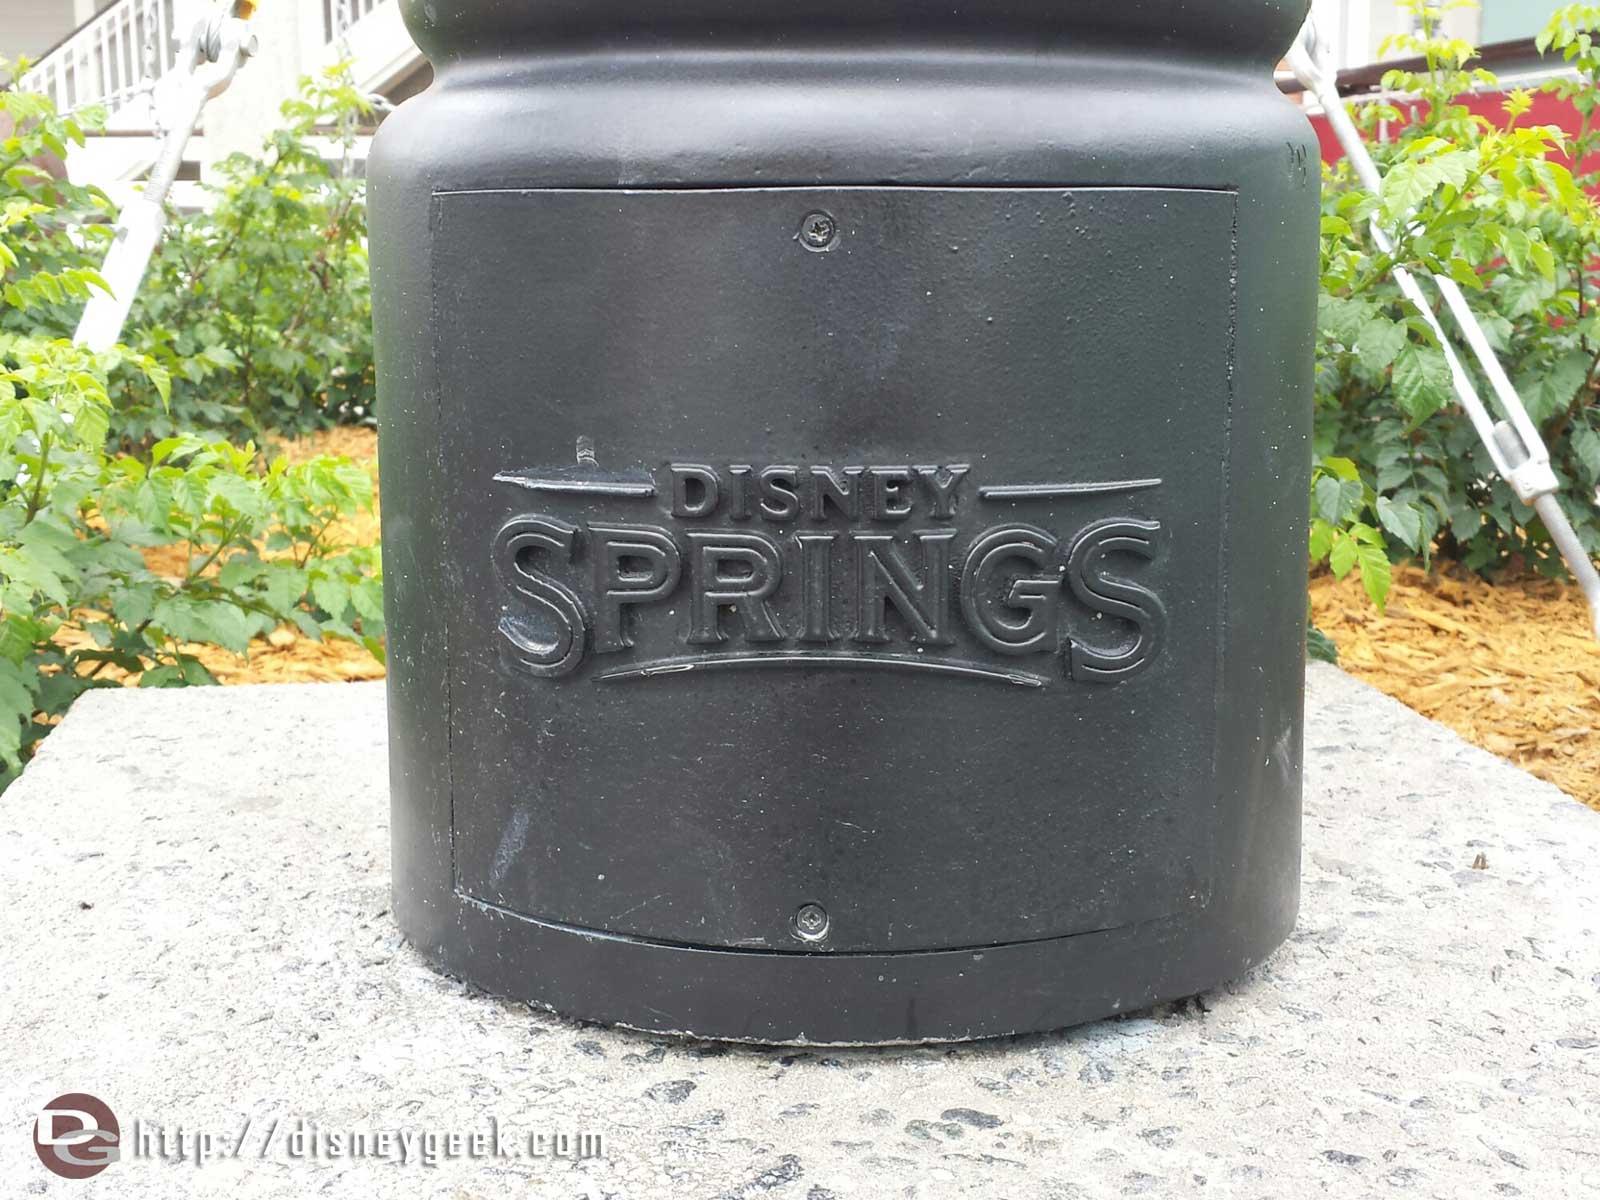 A Disney Springs lamp post near Fultons